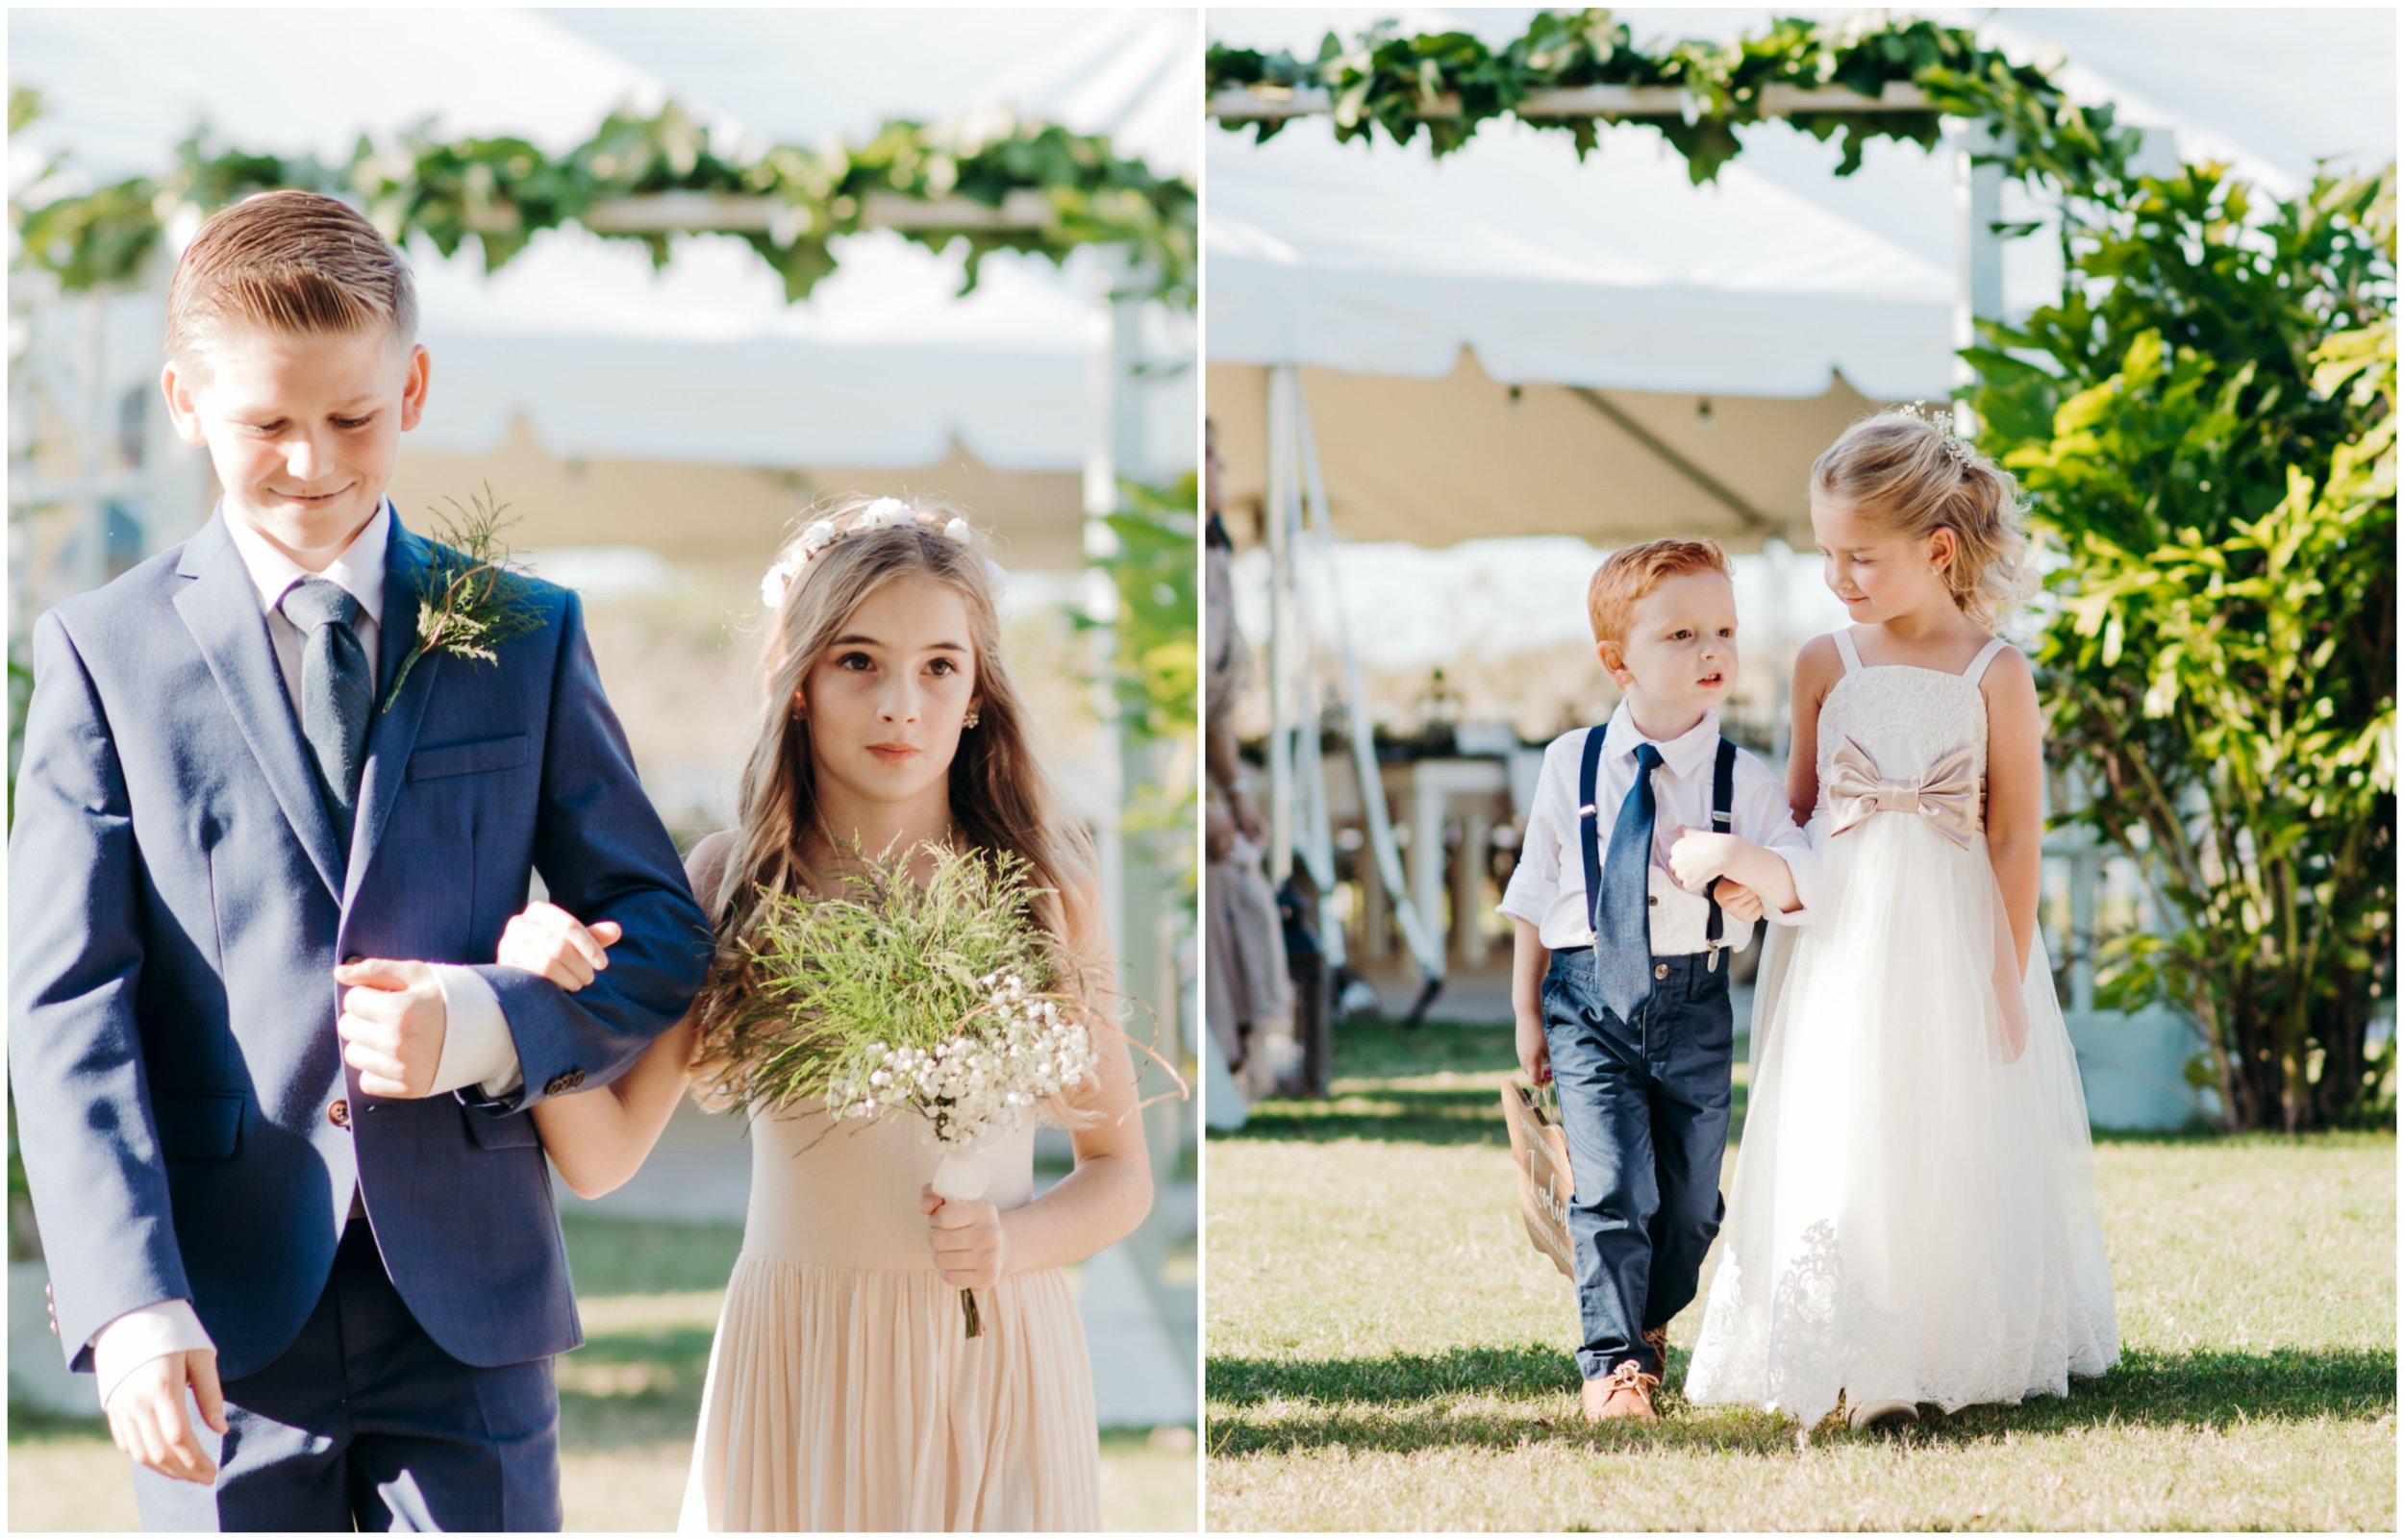 micayla-greyson-wedding-ceremony-intros-3.jpg